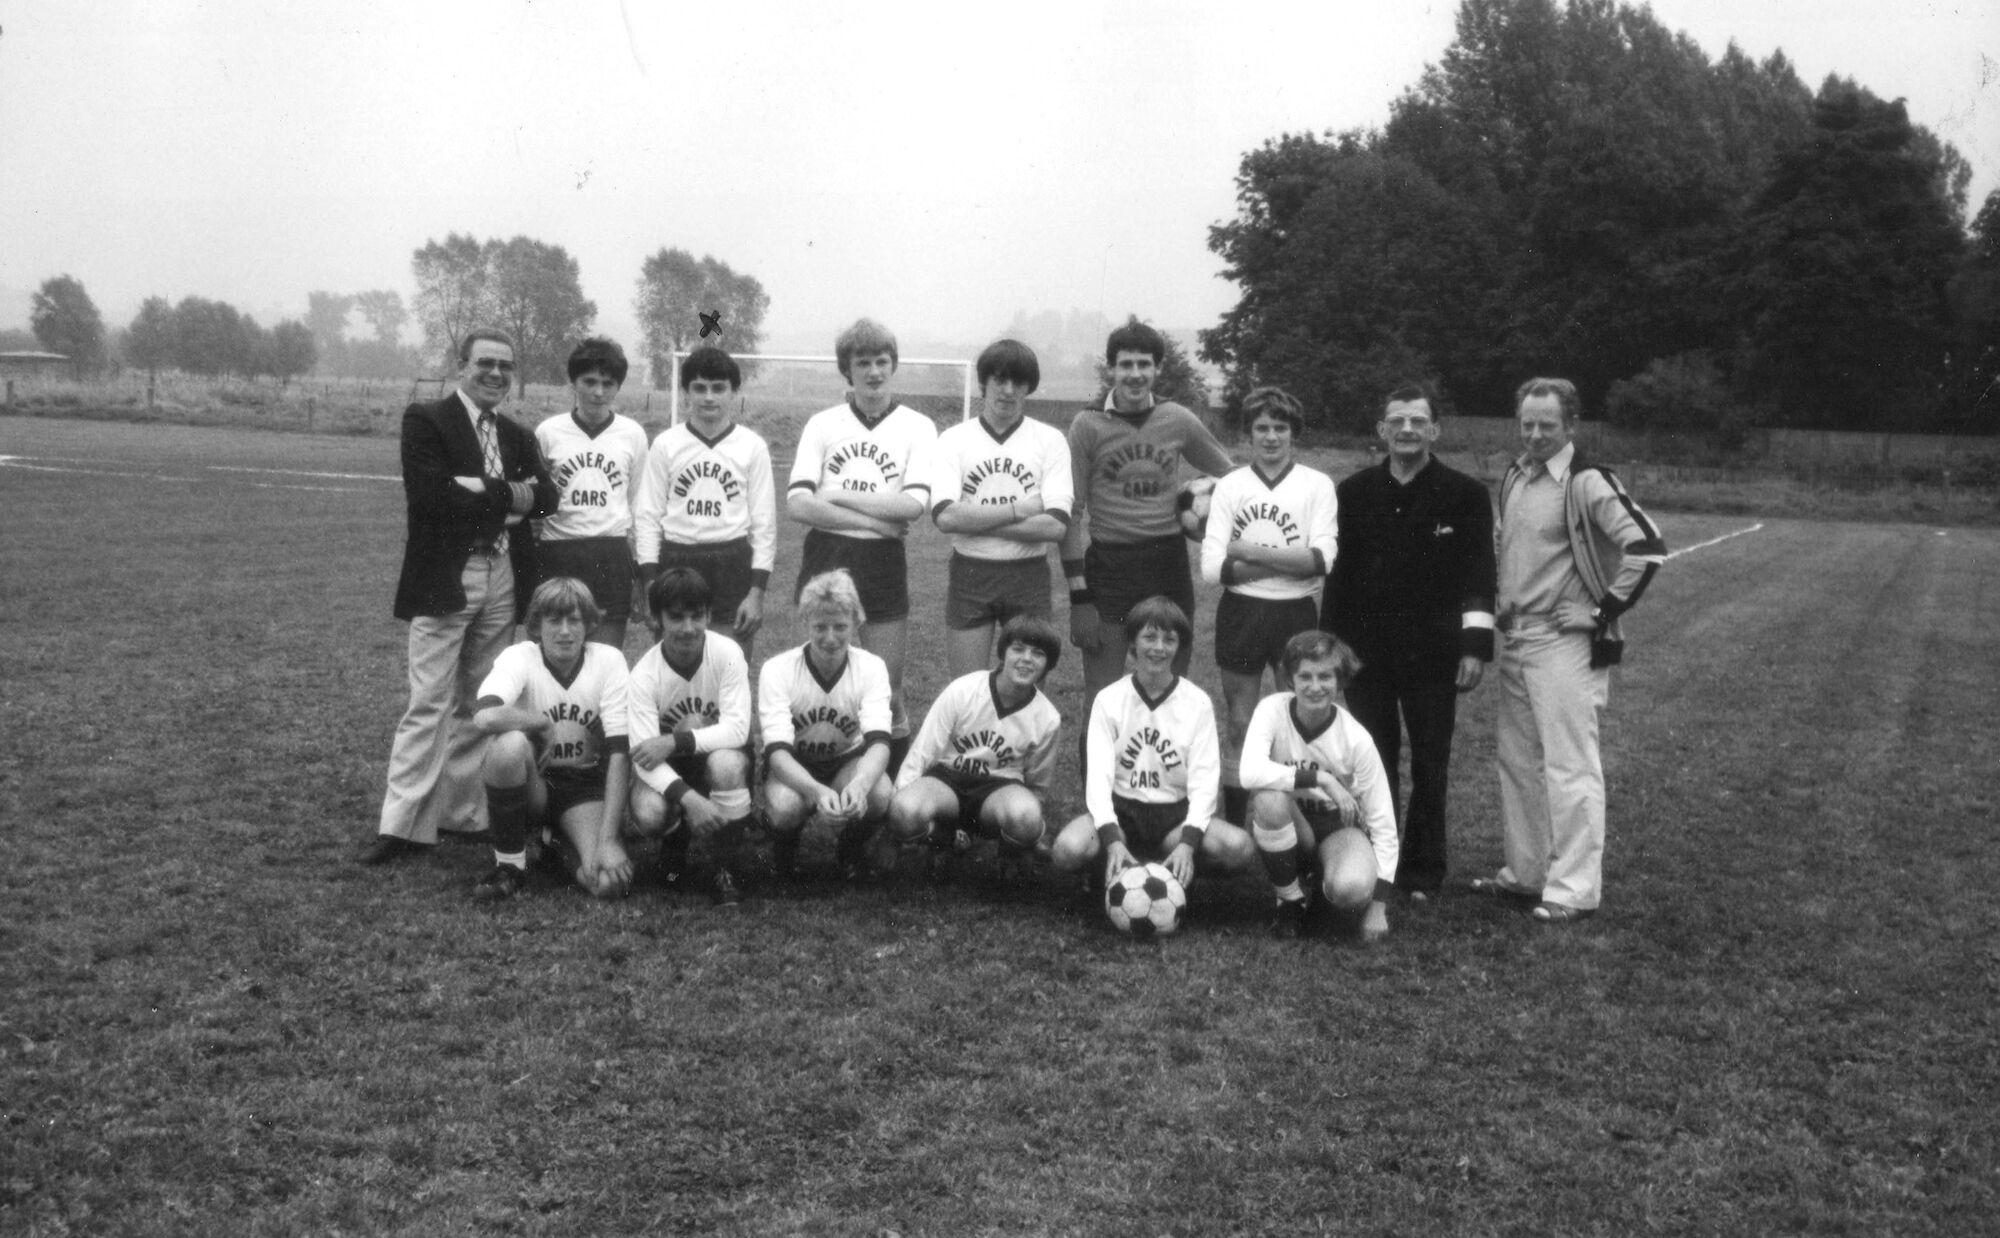 Louise Marie: groepsfoto voetbalploeg jongeren